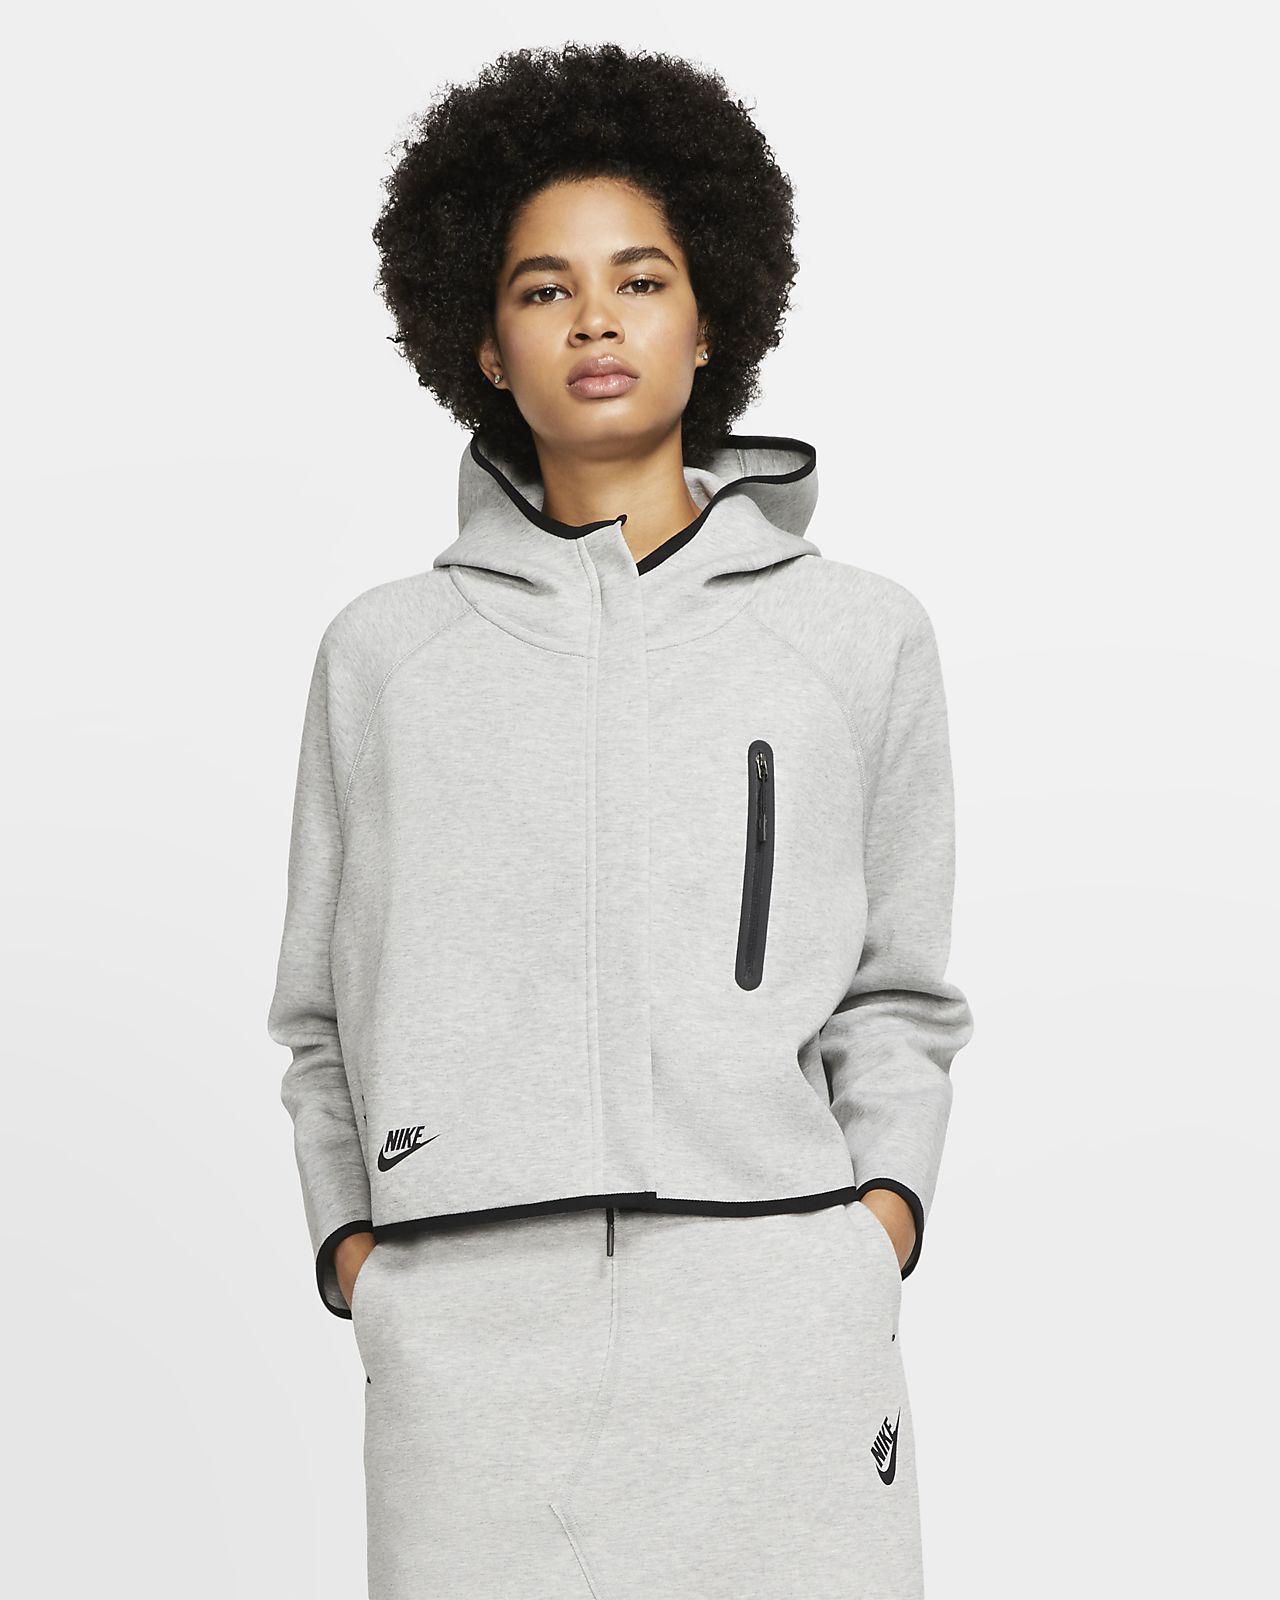 Capa para mujer Nike Sportswear Tech Fleece